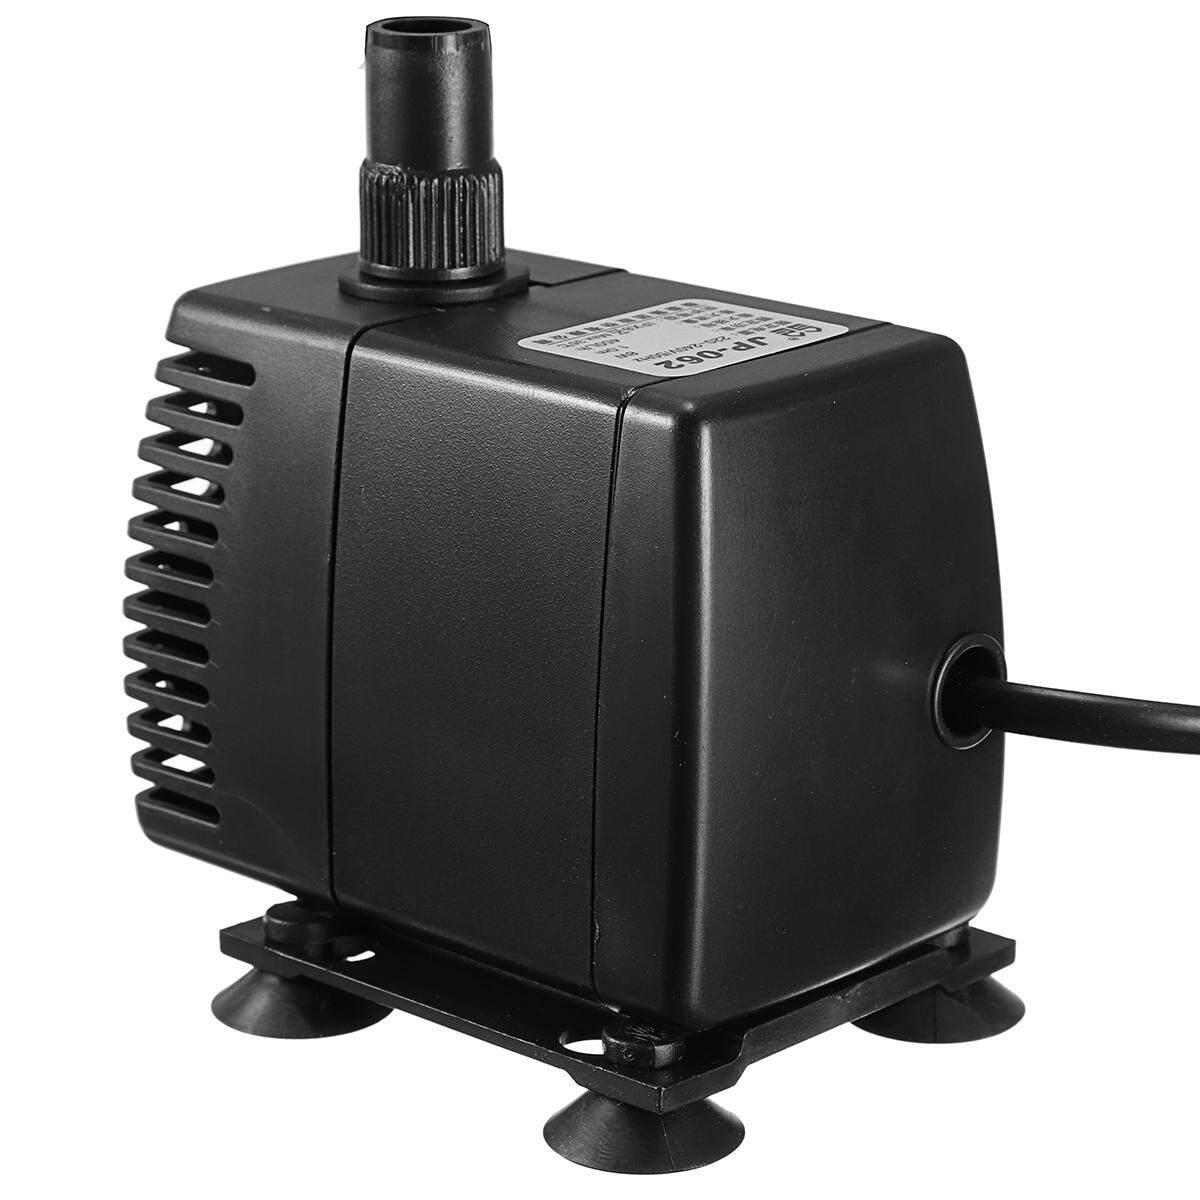 8 W 450L/H Pompa Celup Akuarium Tangki Ikan Powerhead Filter & Sucker-Intl - 2